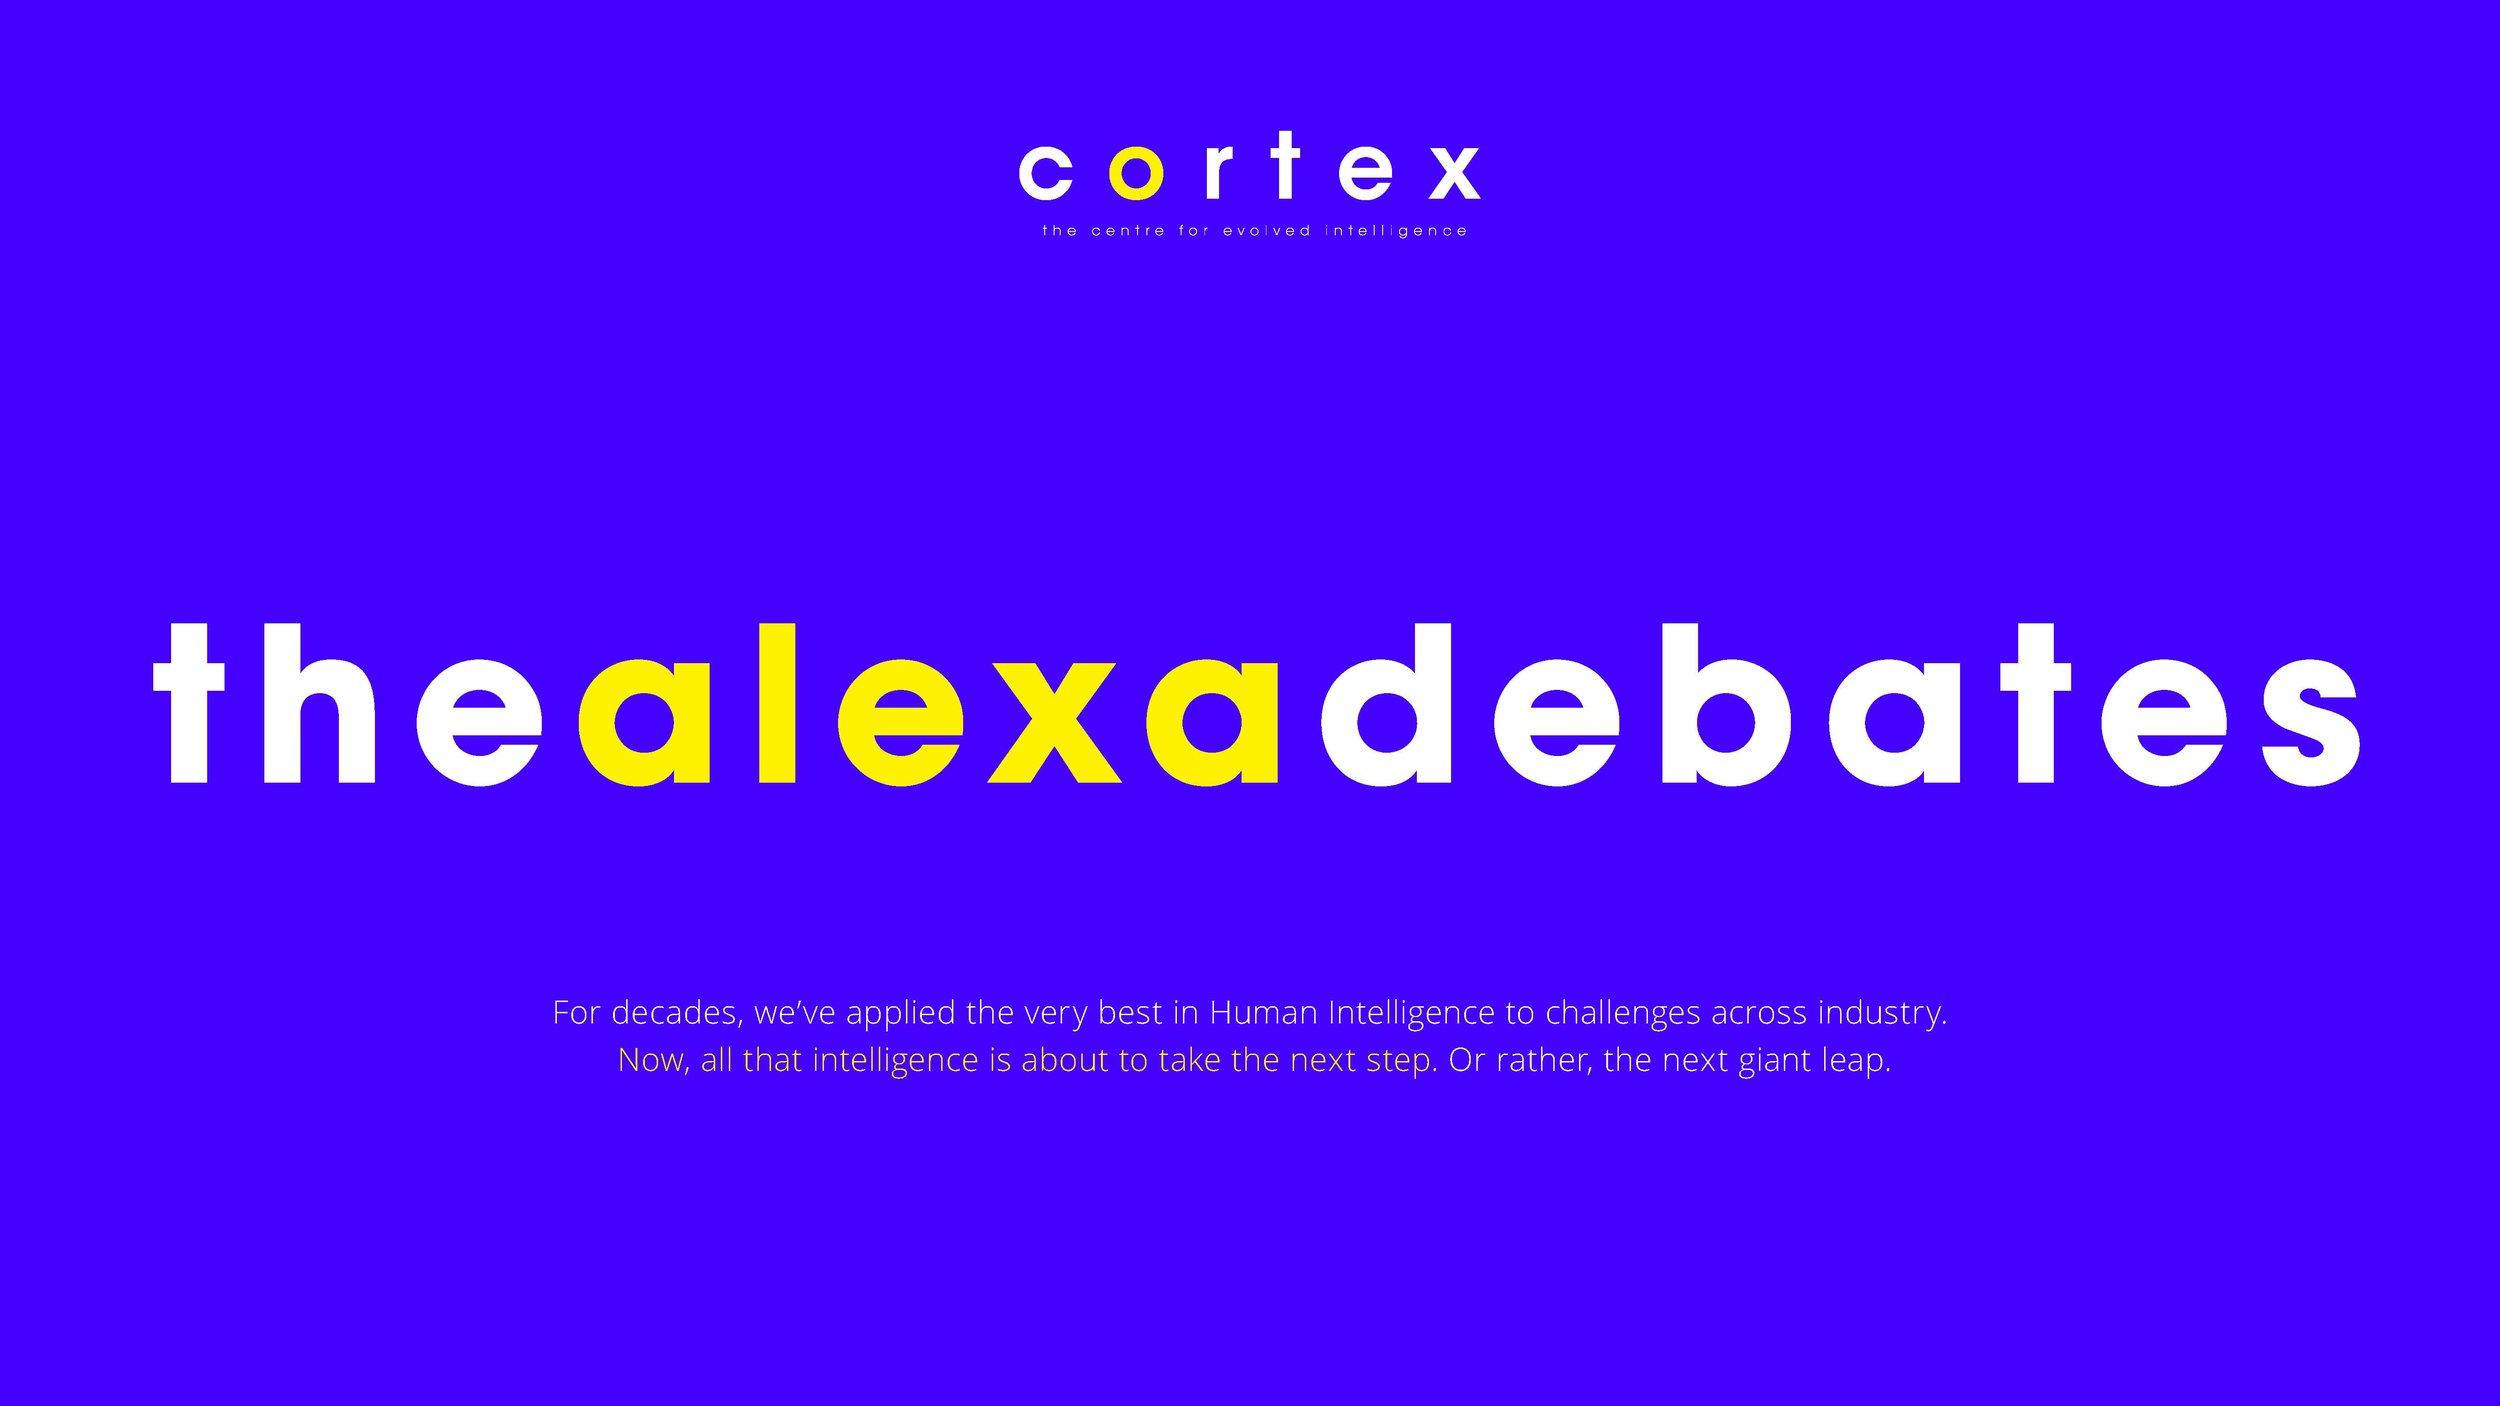 Cortex_Page_3.jpg